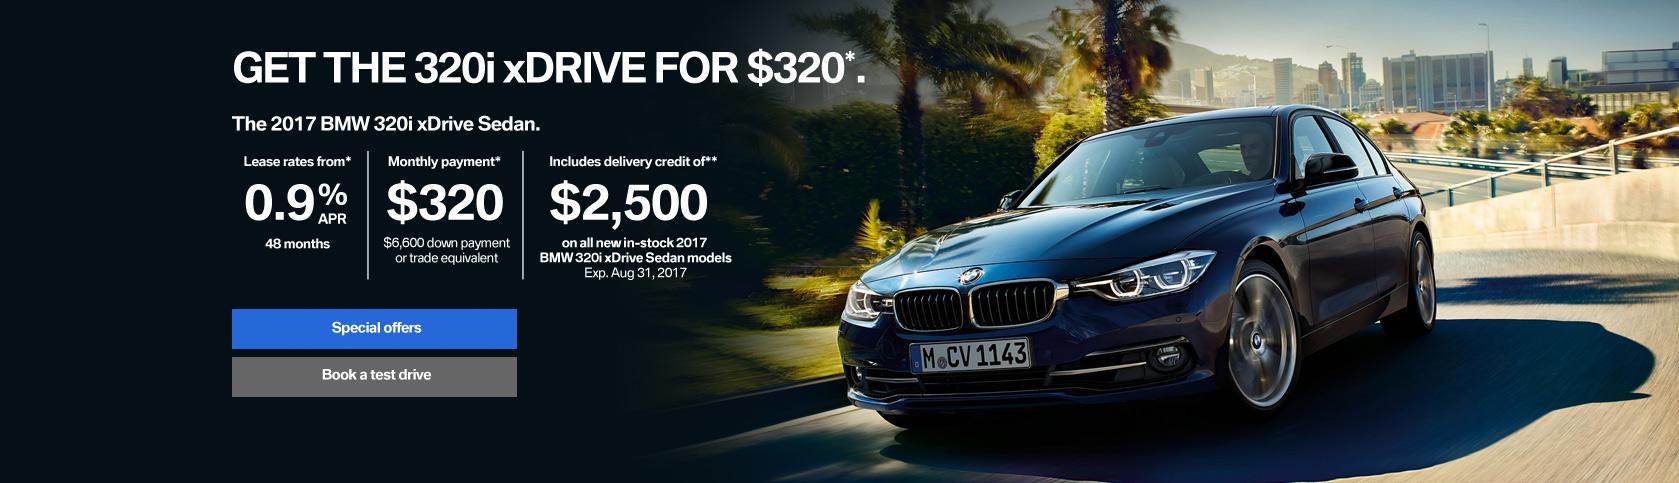 2017_BMW_JulyDAG_3er_Banner_1679x483_GTA